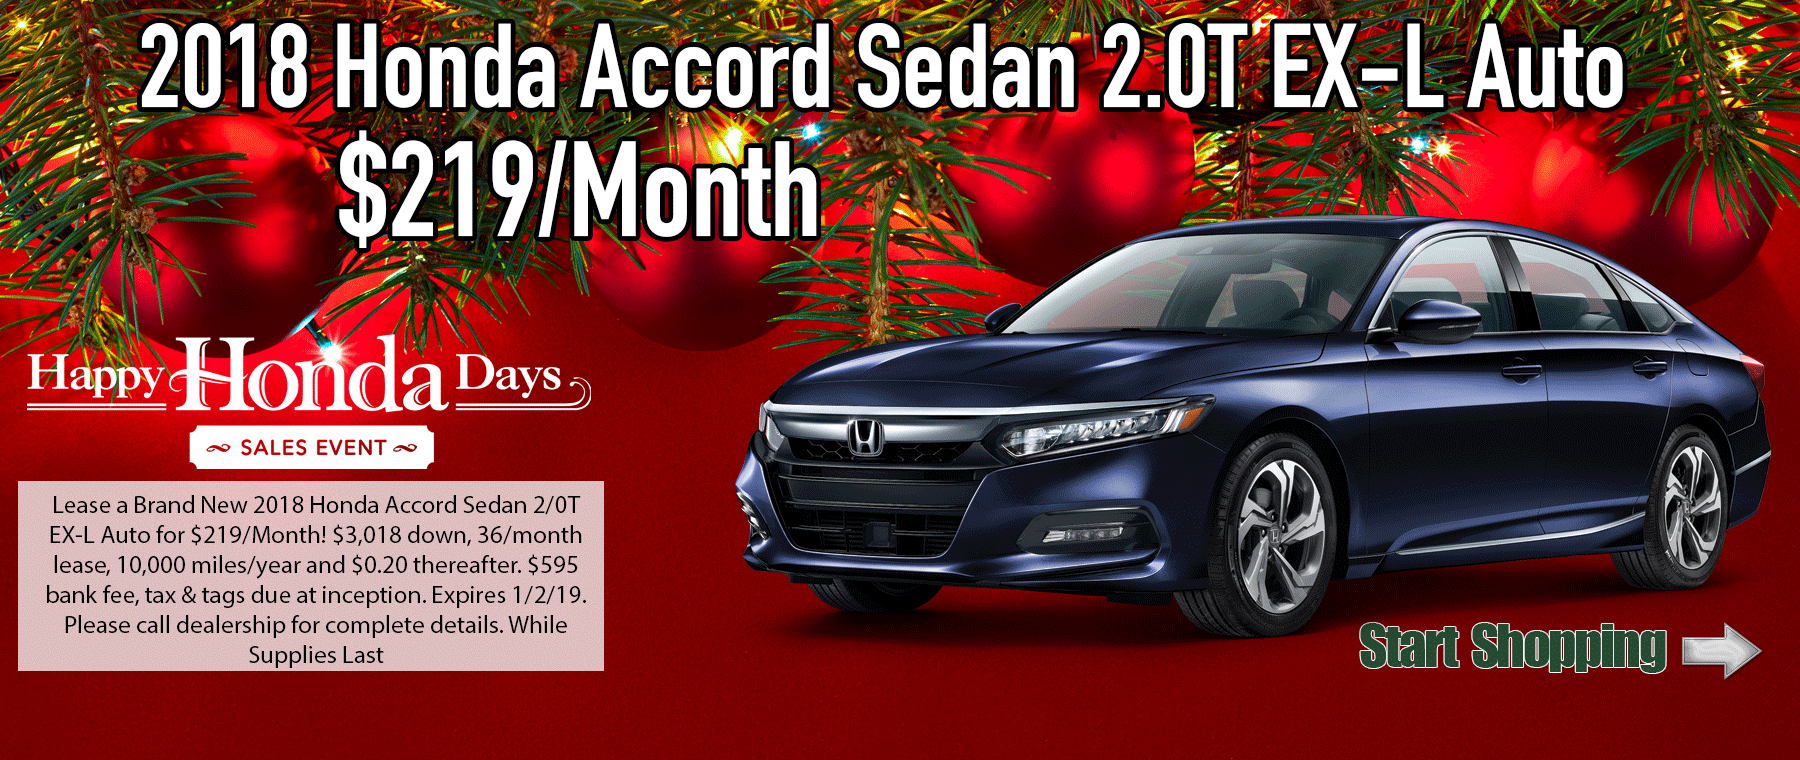 Honda Accord Sedan 1/0T EXL Auto